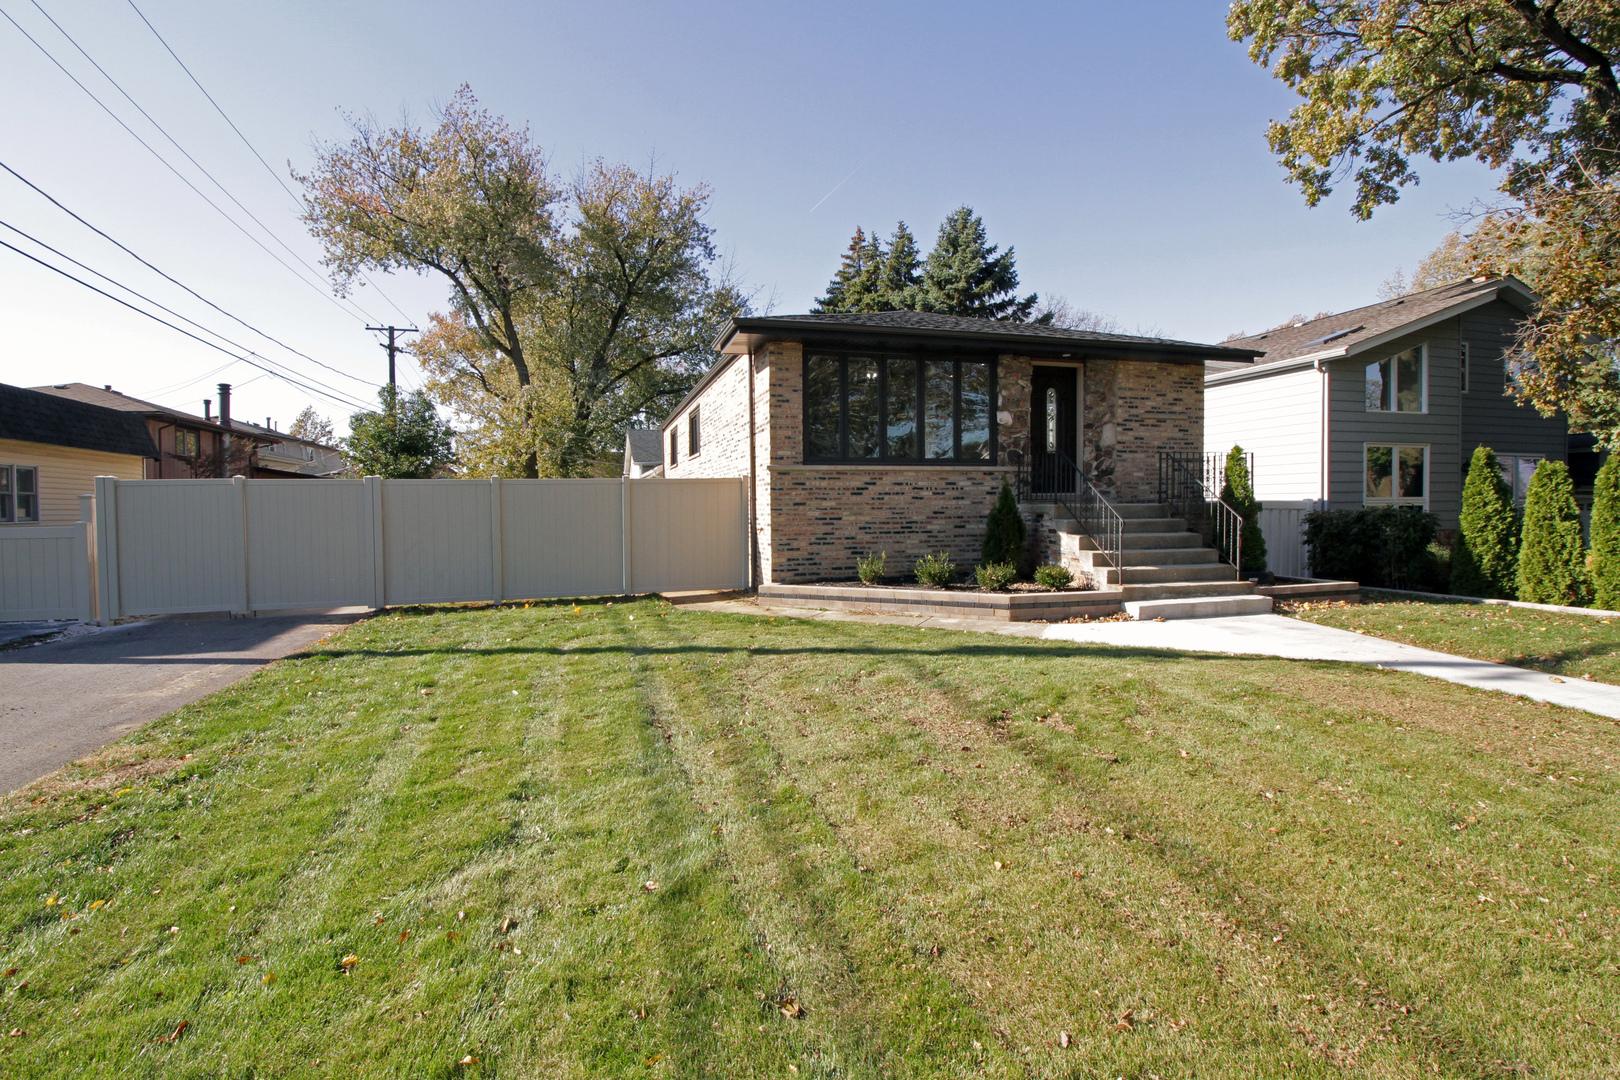 10650 South 82nd Avenue, Palos Hills, Illinois